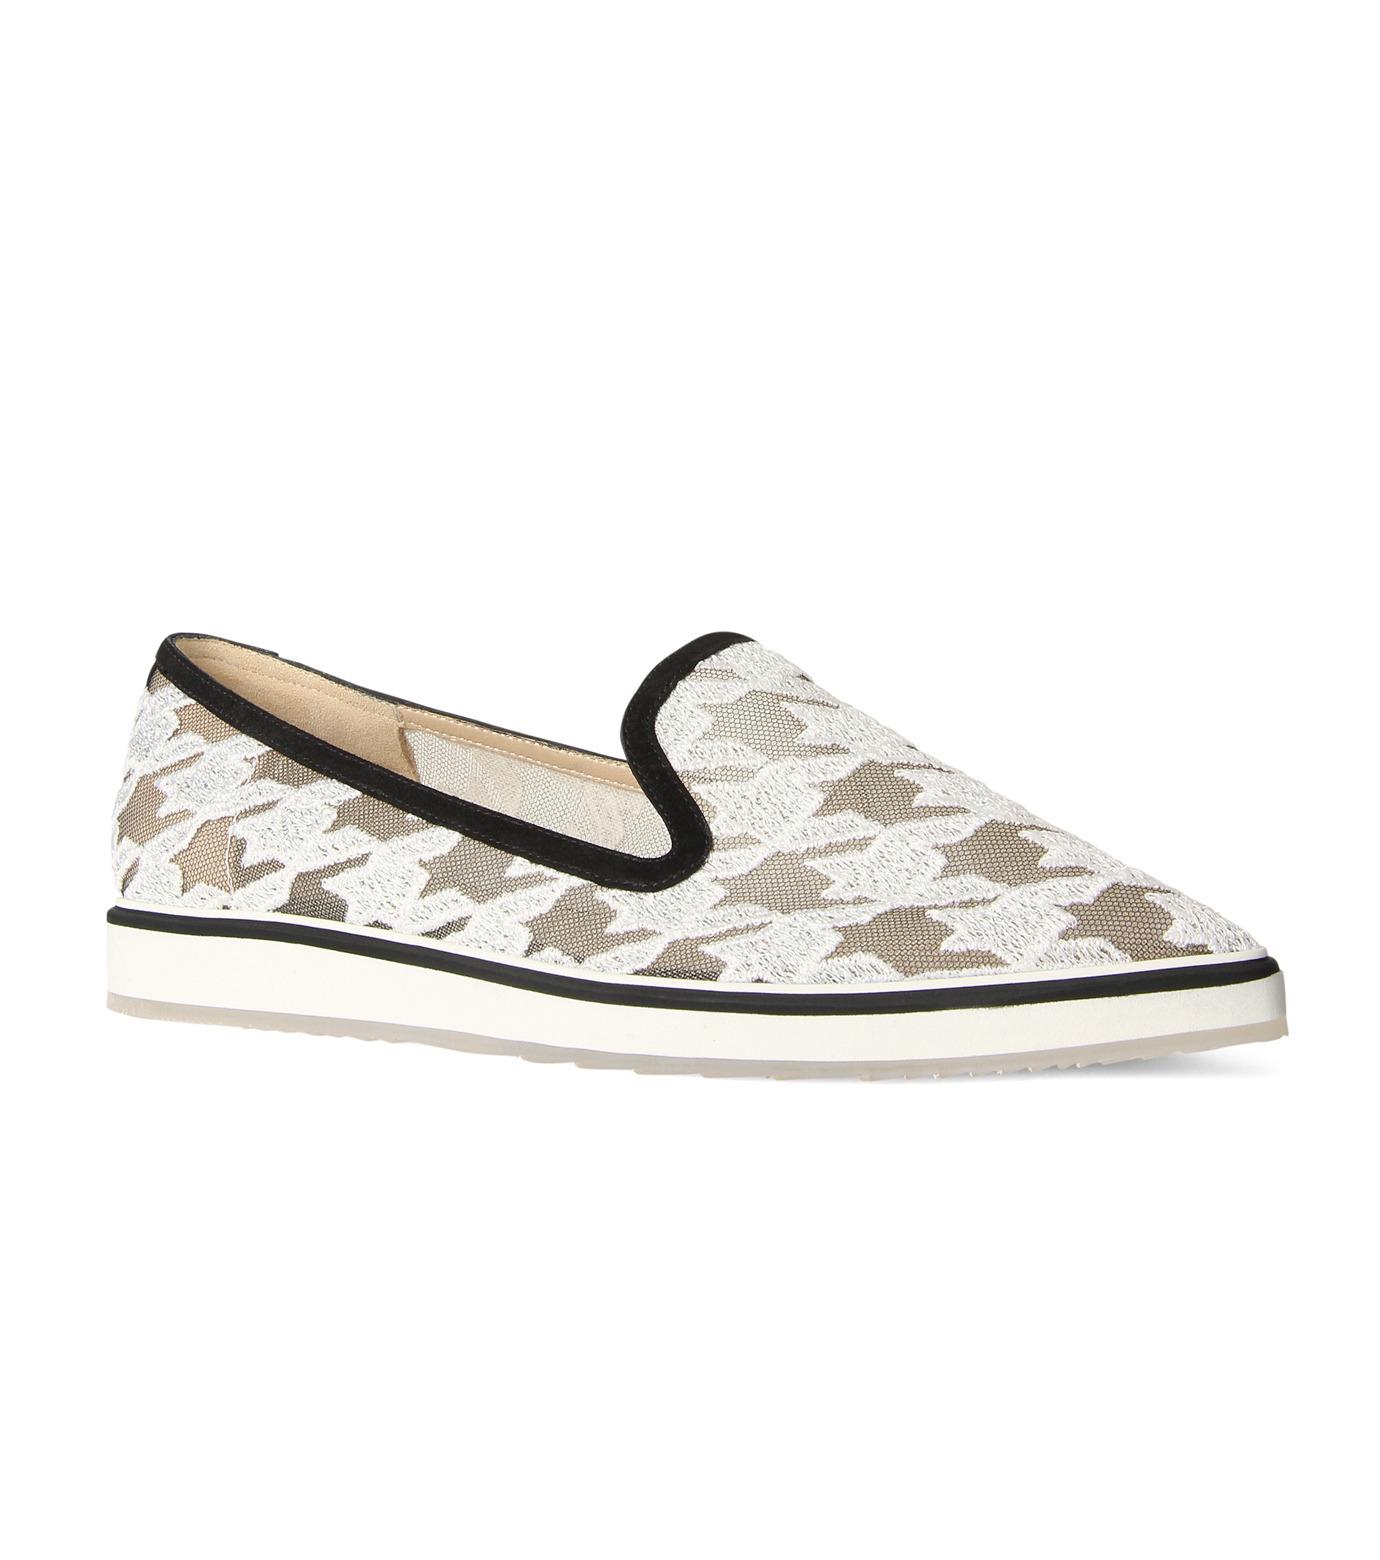 Nicholas  Kirkwood(ニコラス カークウッド)の35mm Alona Lace Loafer-WHITE(フラットシューズ/Flat shoes)-15A093-4 拡大詳細画像1